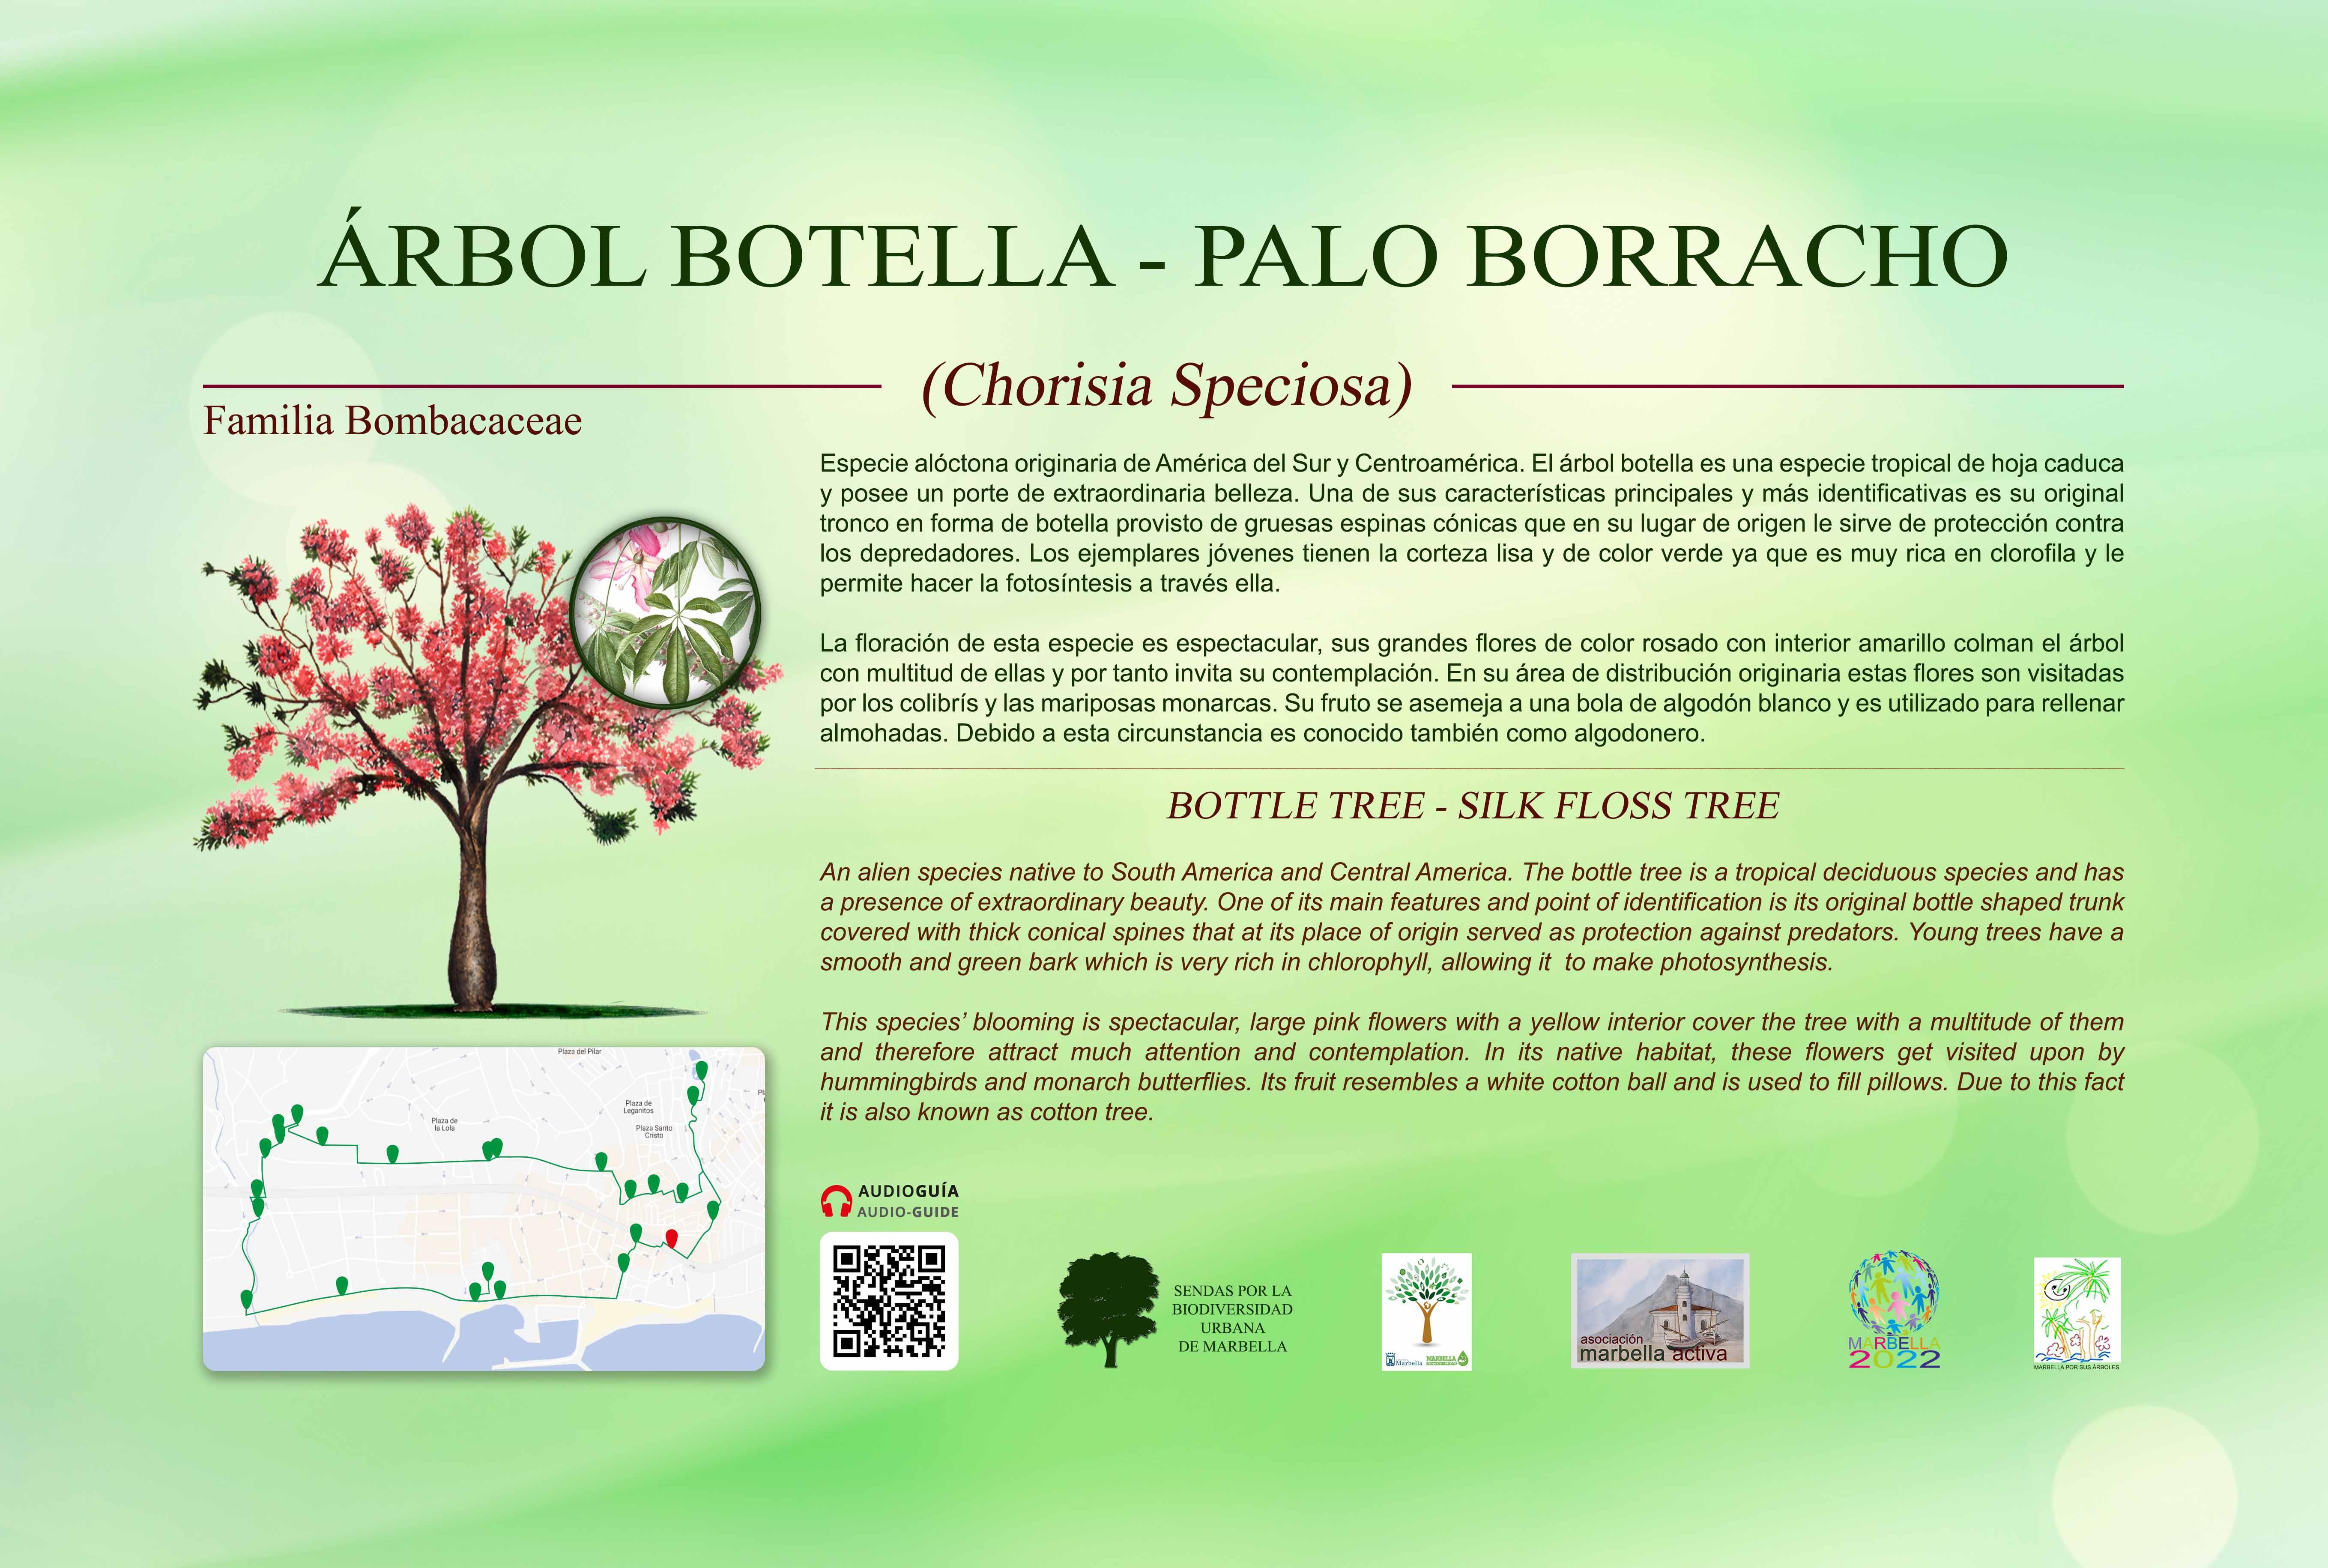 24-CARTELES-arboles-40-x-25-cm-marbella